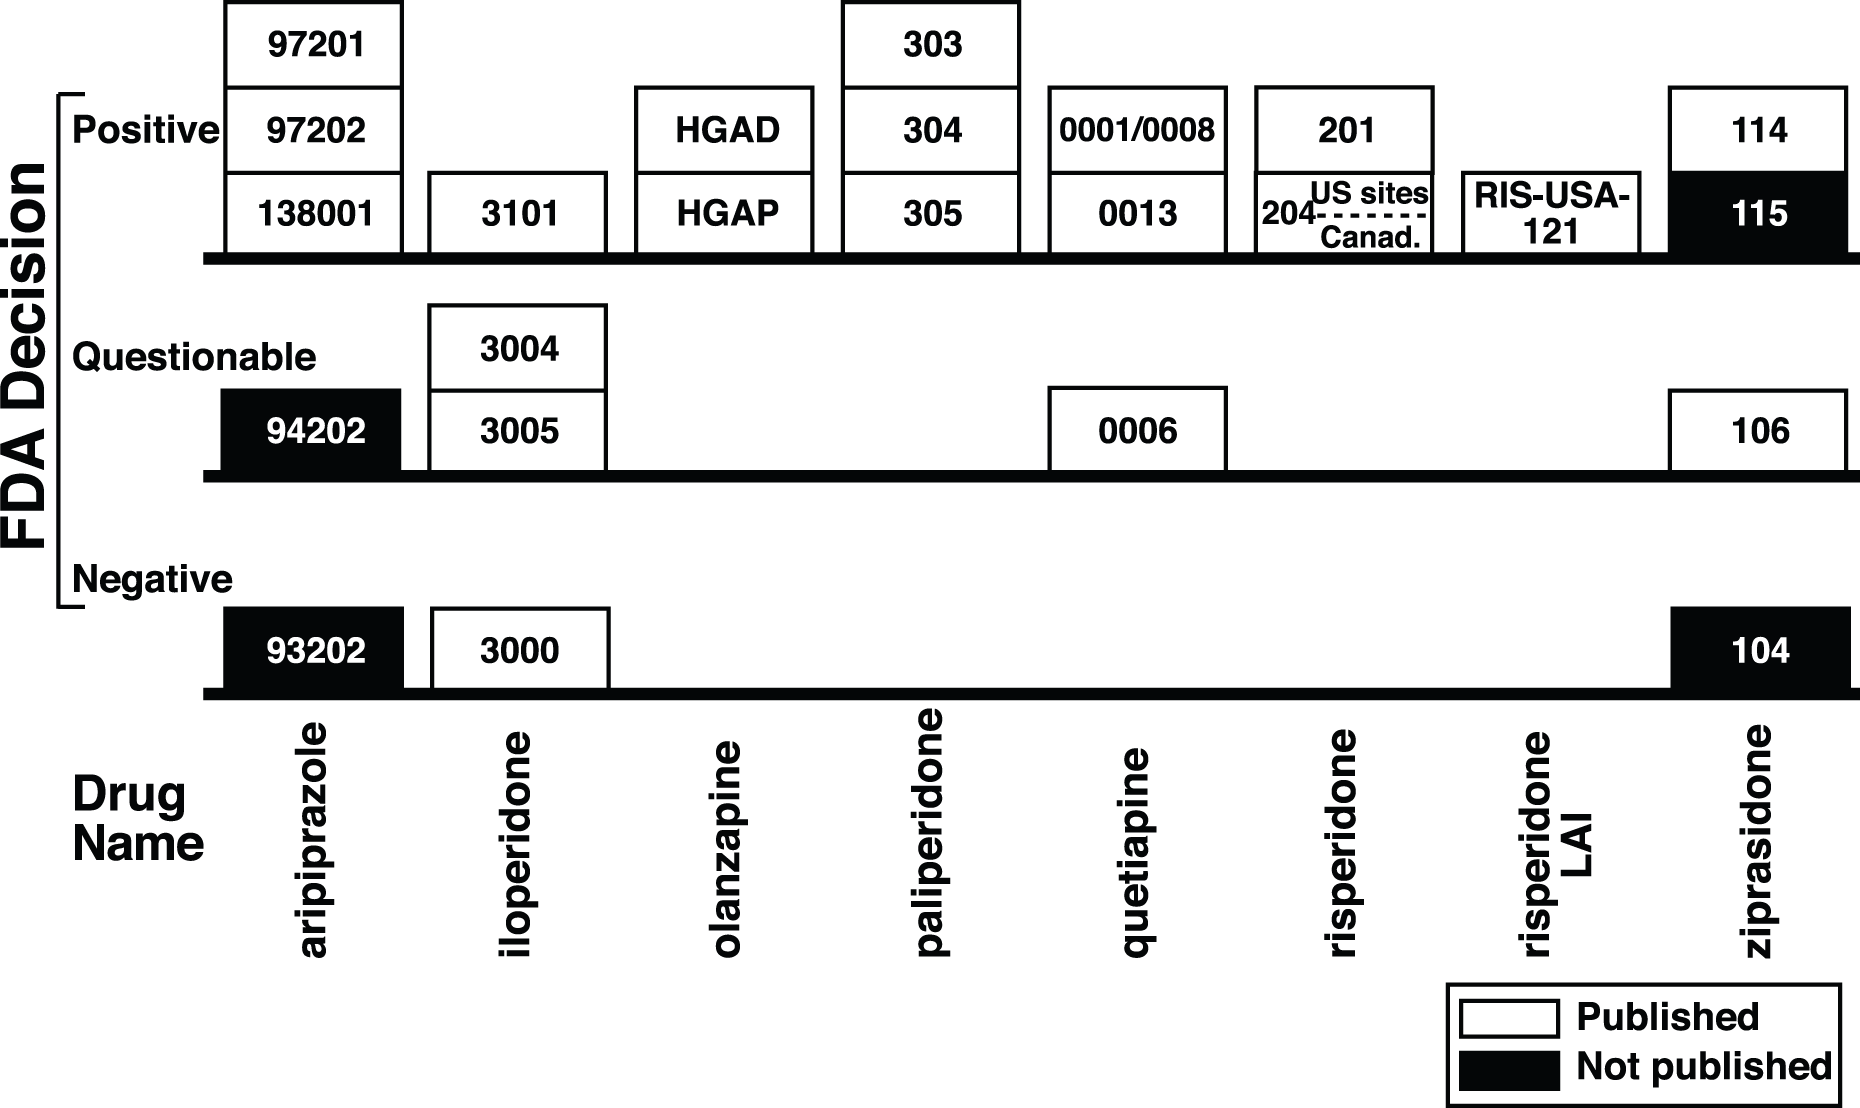 Trial outcome according to the FDA versus publication status of 24 premarketing trials of eight second-generation antipsychotics.